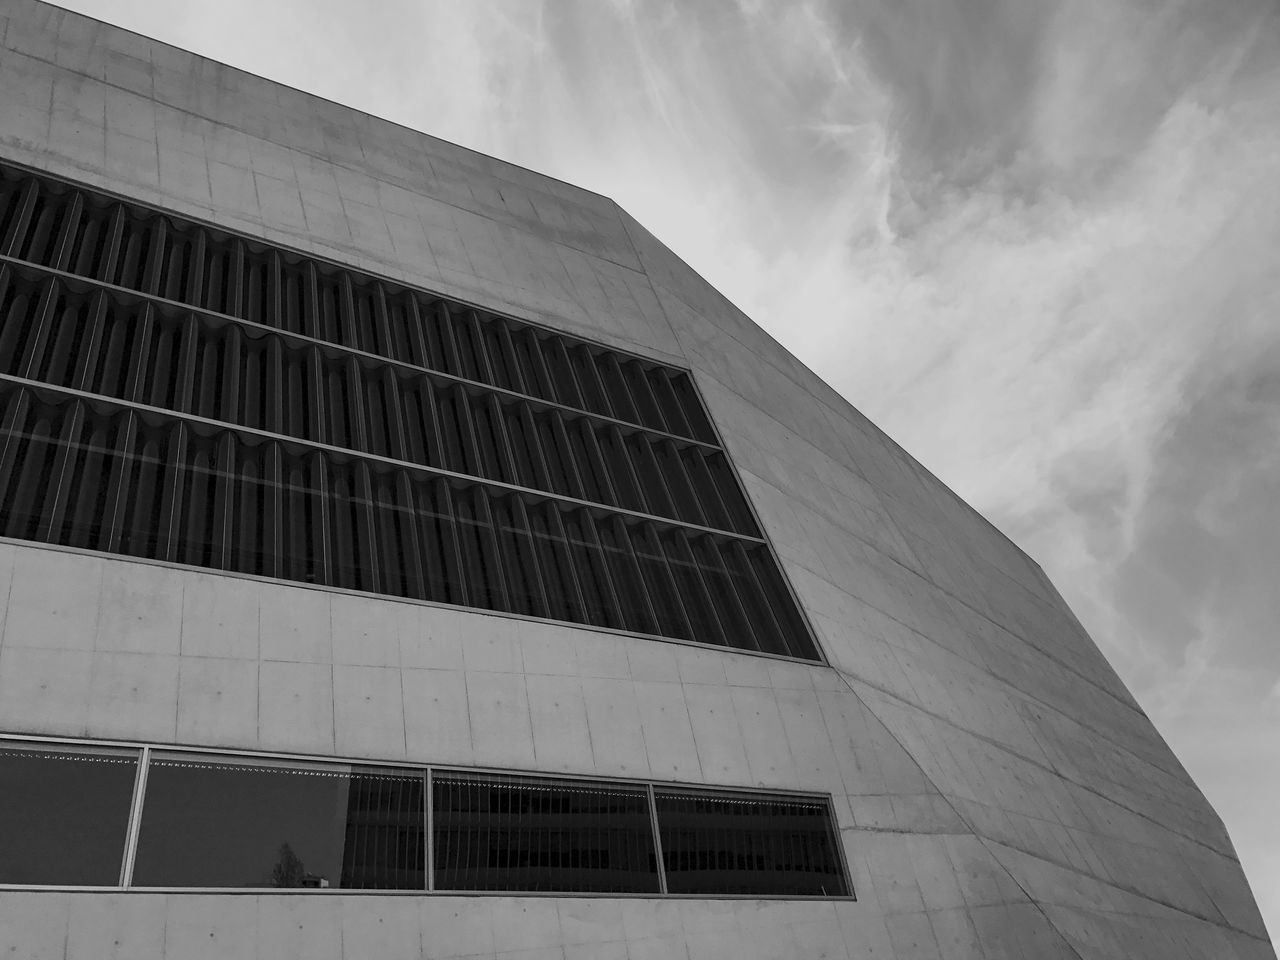 Architecture Blackandwhite Casadamusica Koolhaas Porto Portugal REM The Architect - 2017 EyeEm Awards